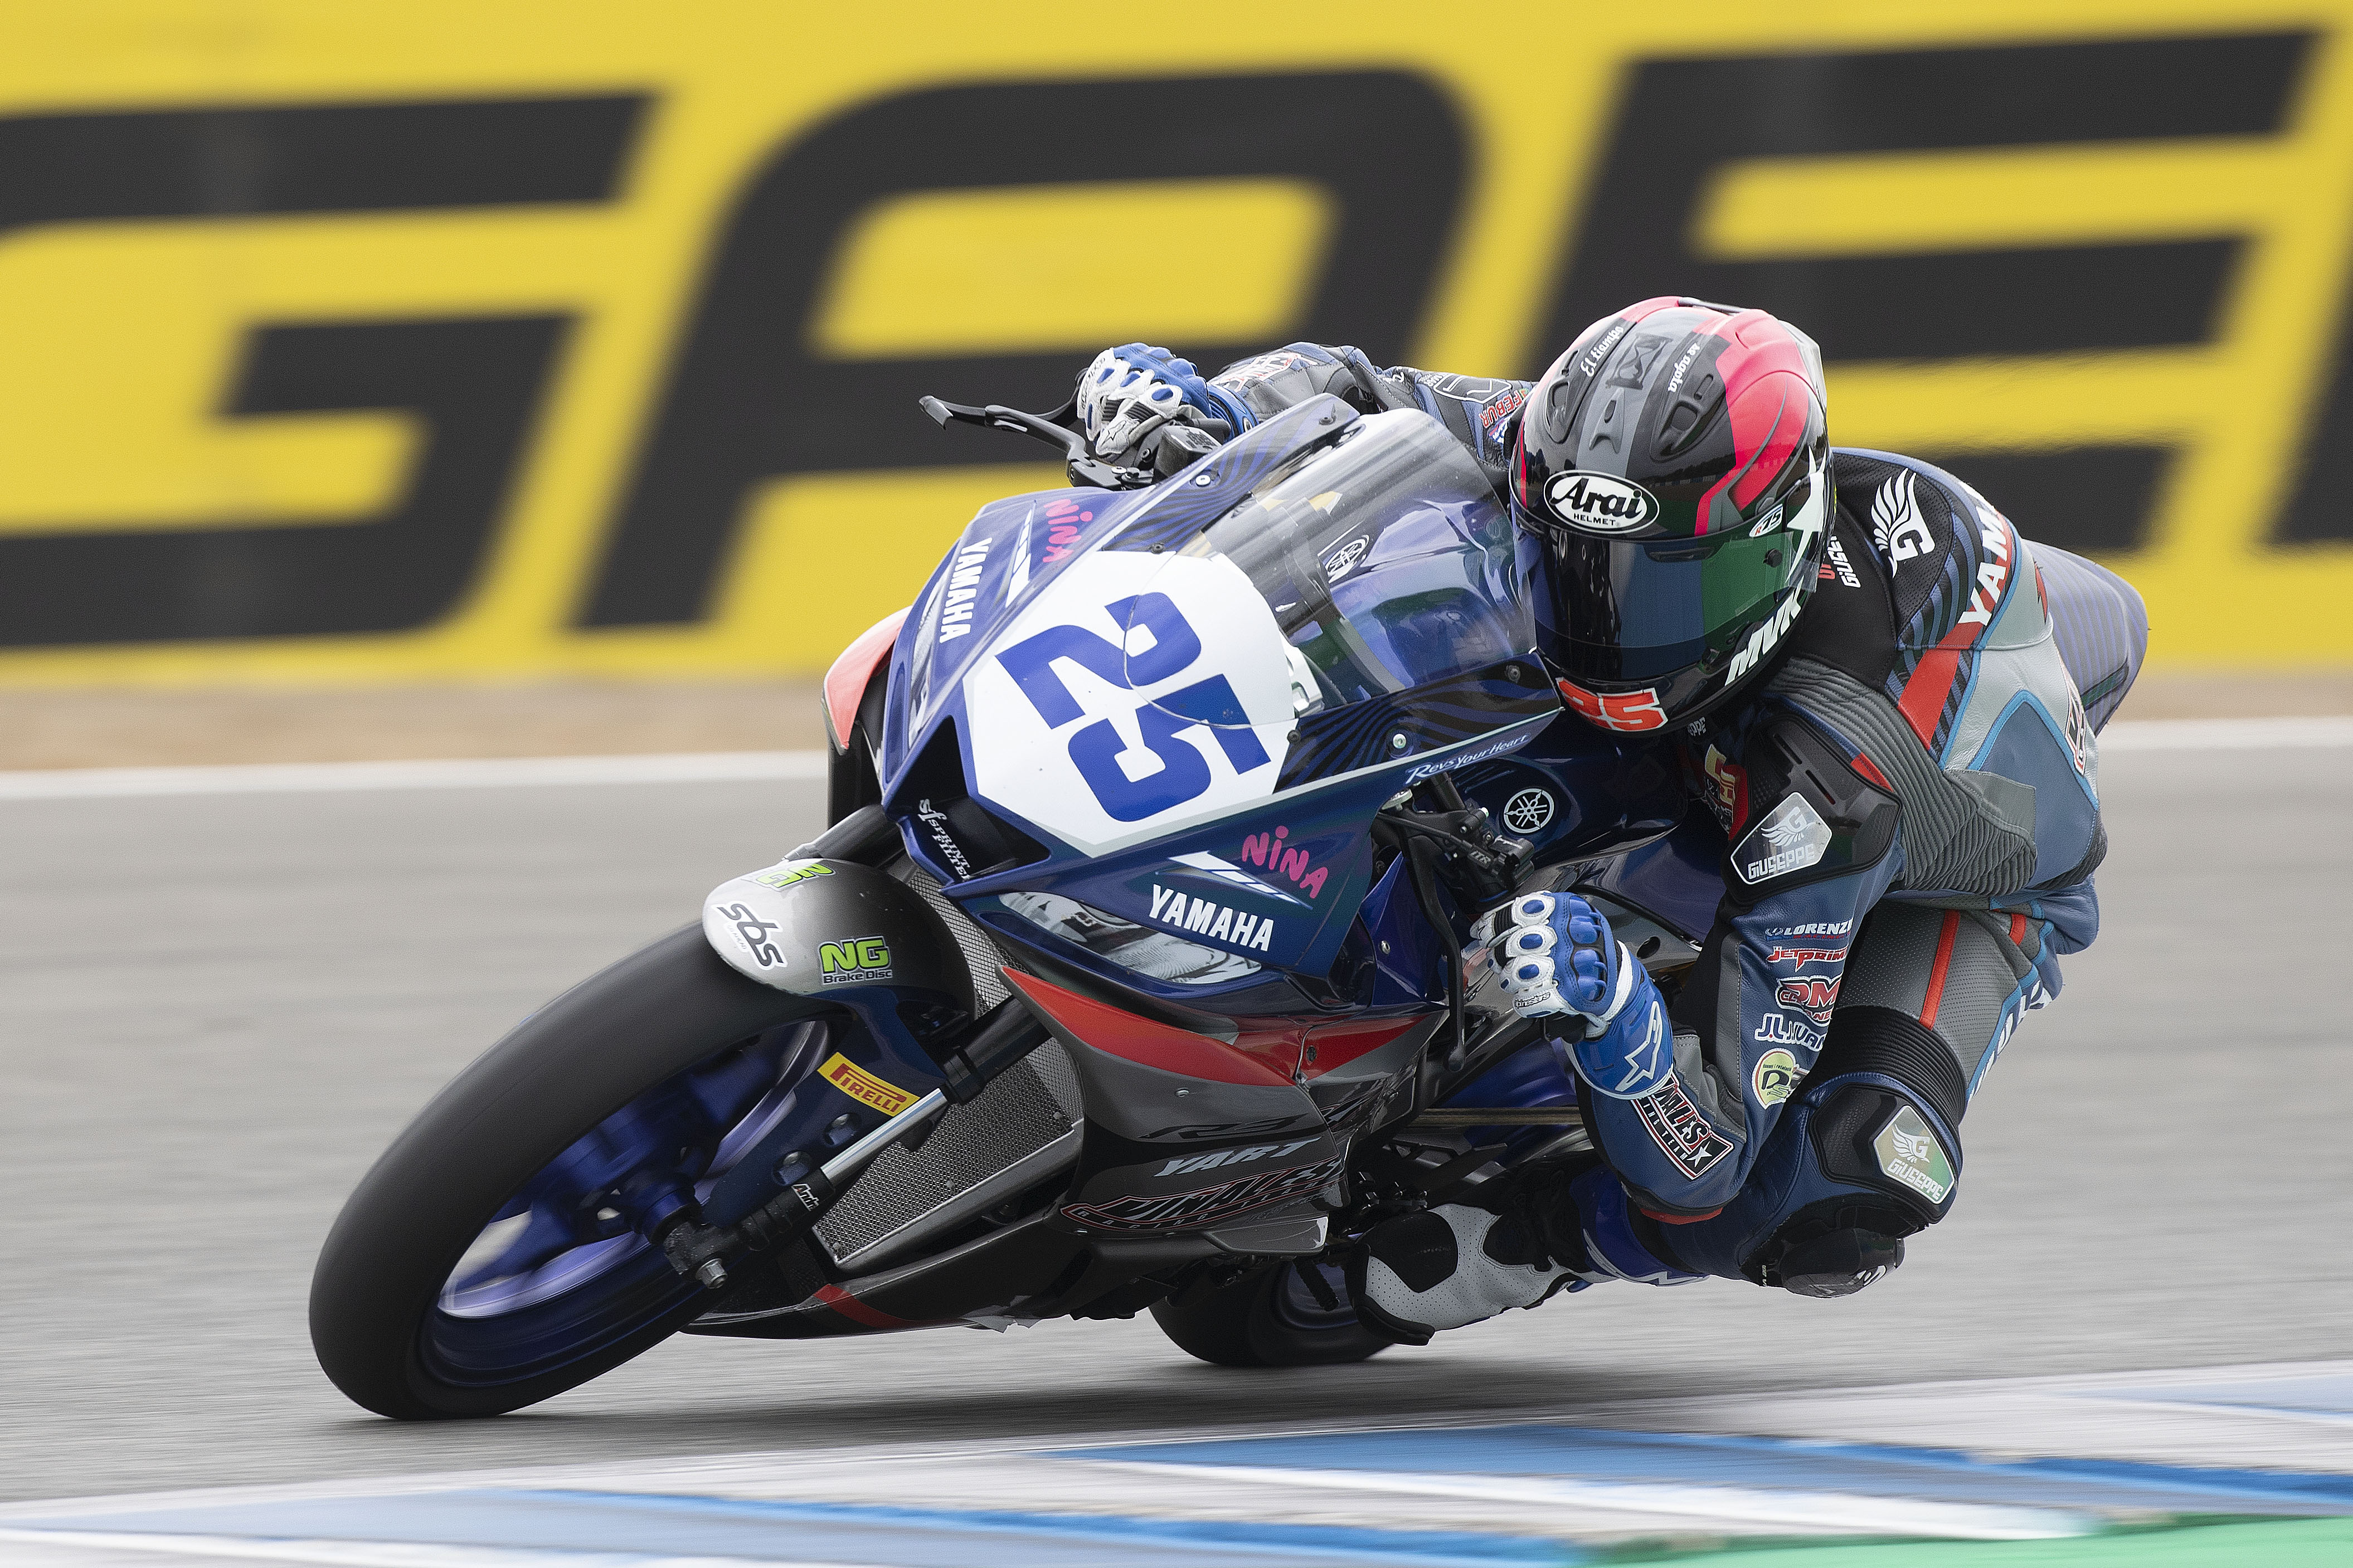 Vinales pulls out of Austin MotoGP round after cousin's death - The Race